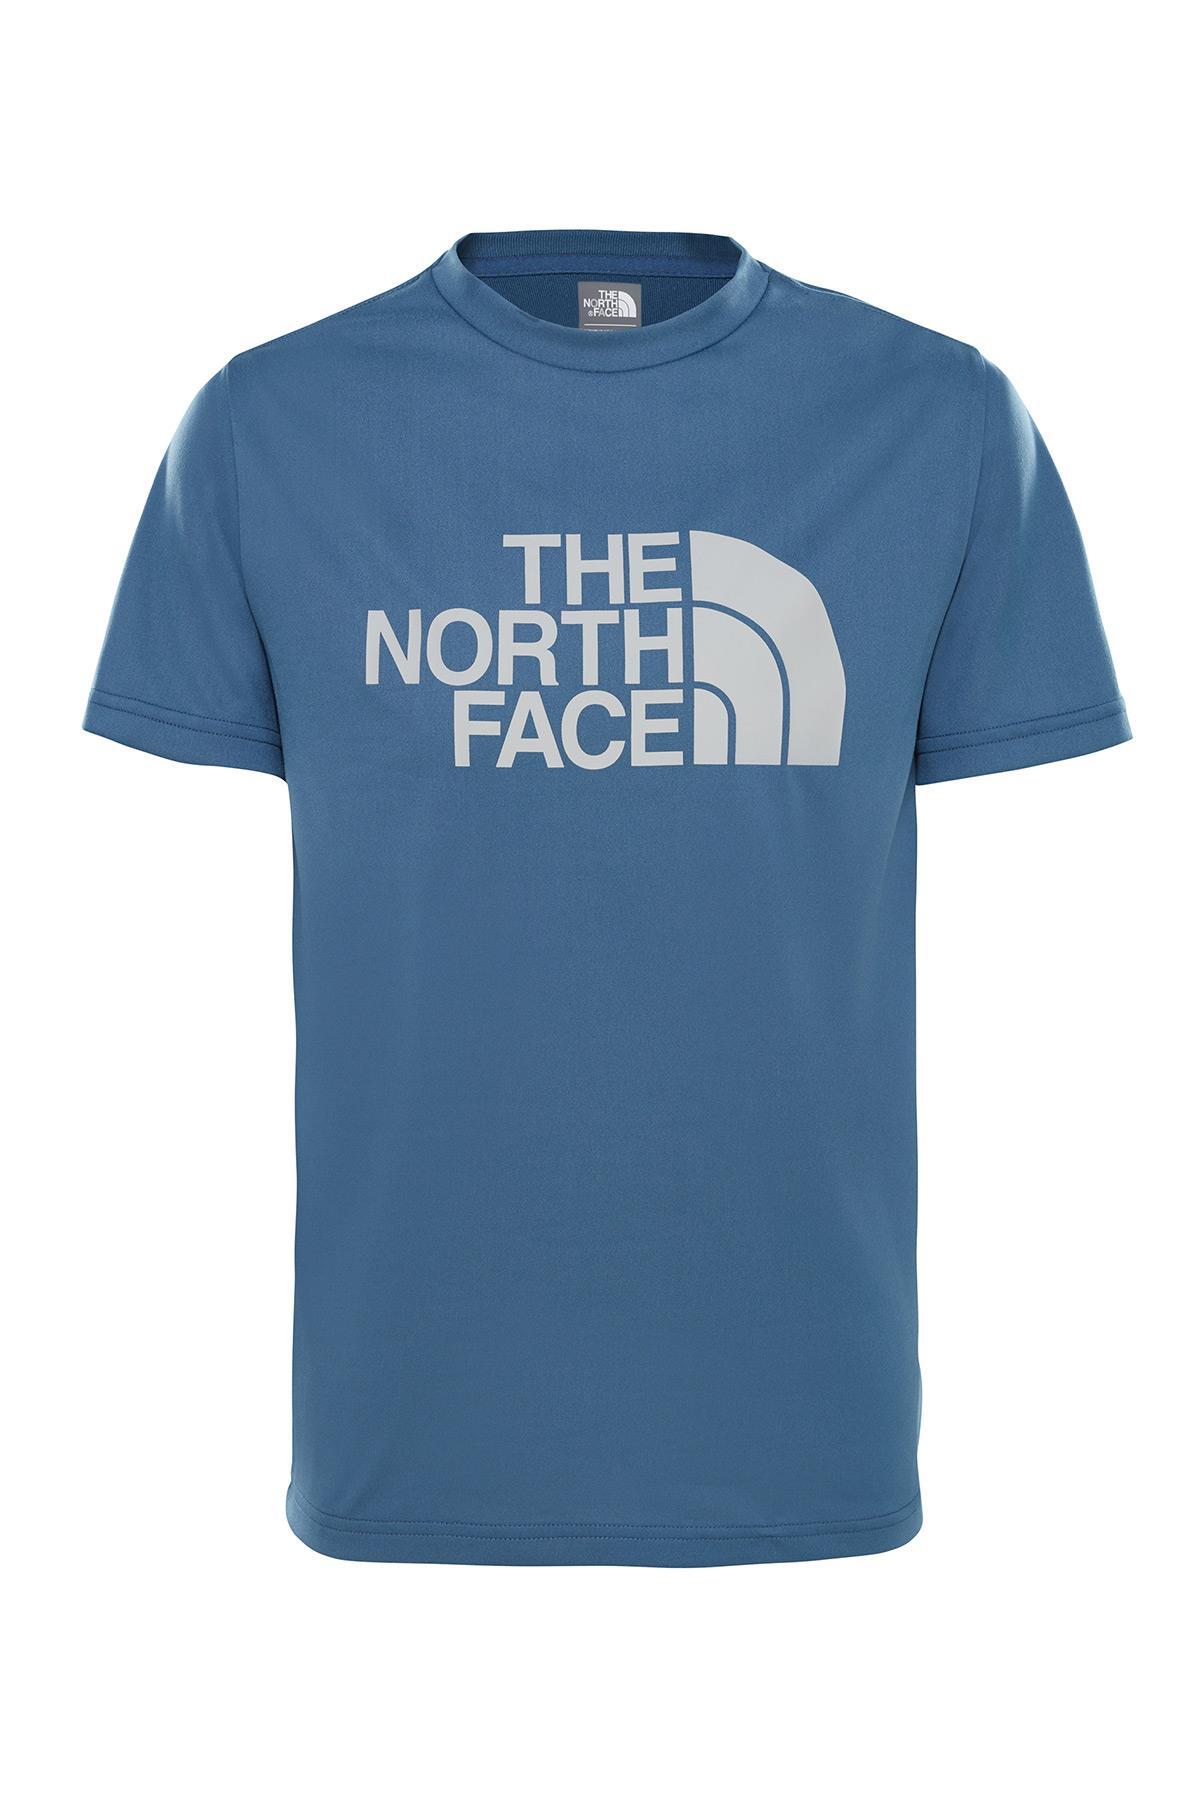 The Northface B S/S Reaxion 2.0 Tee T93S35Hdc Tişört